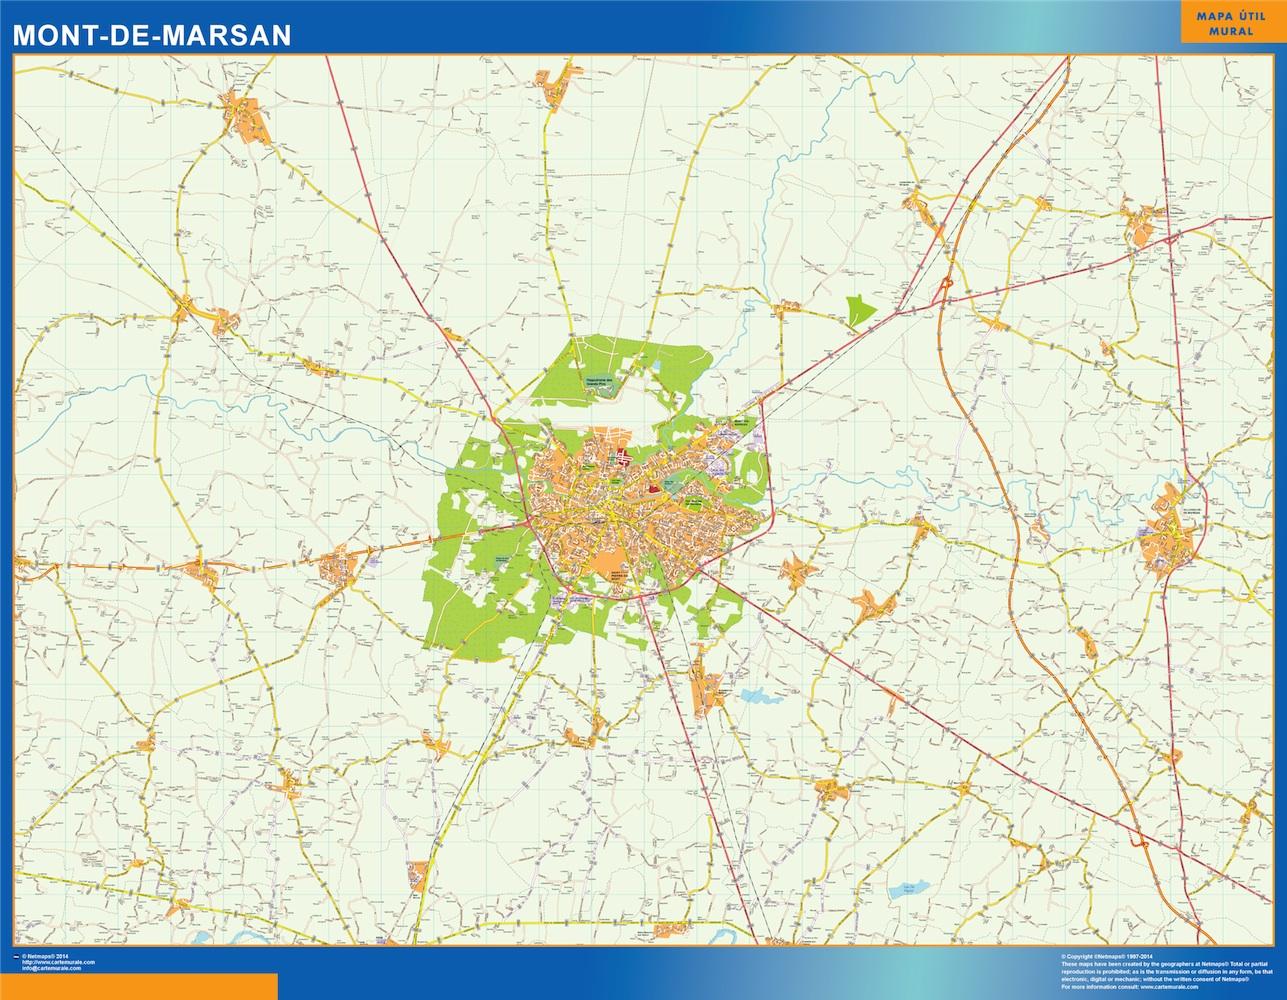 mont-de-marsan street map